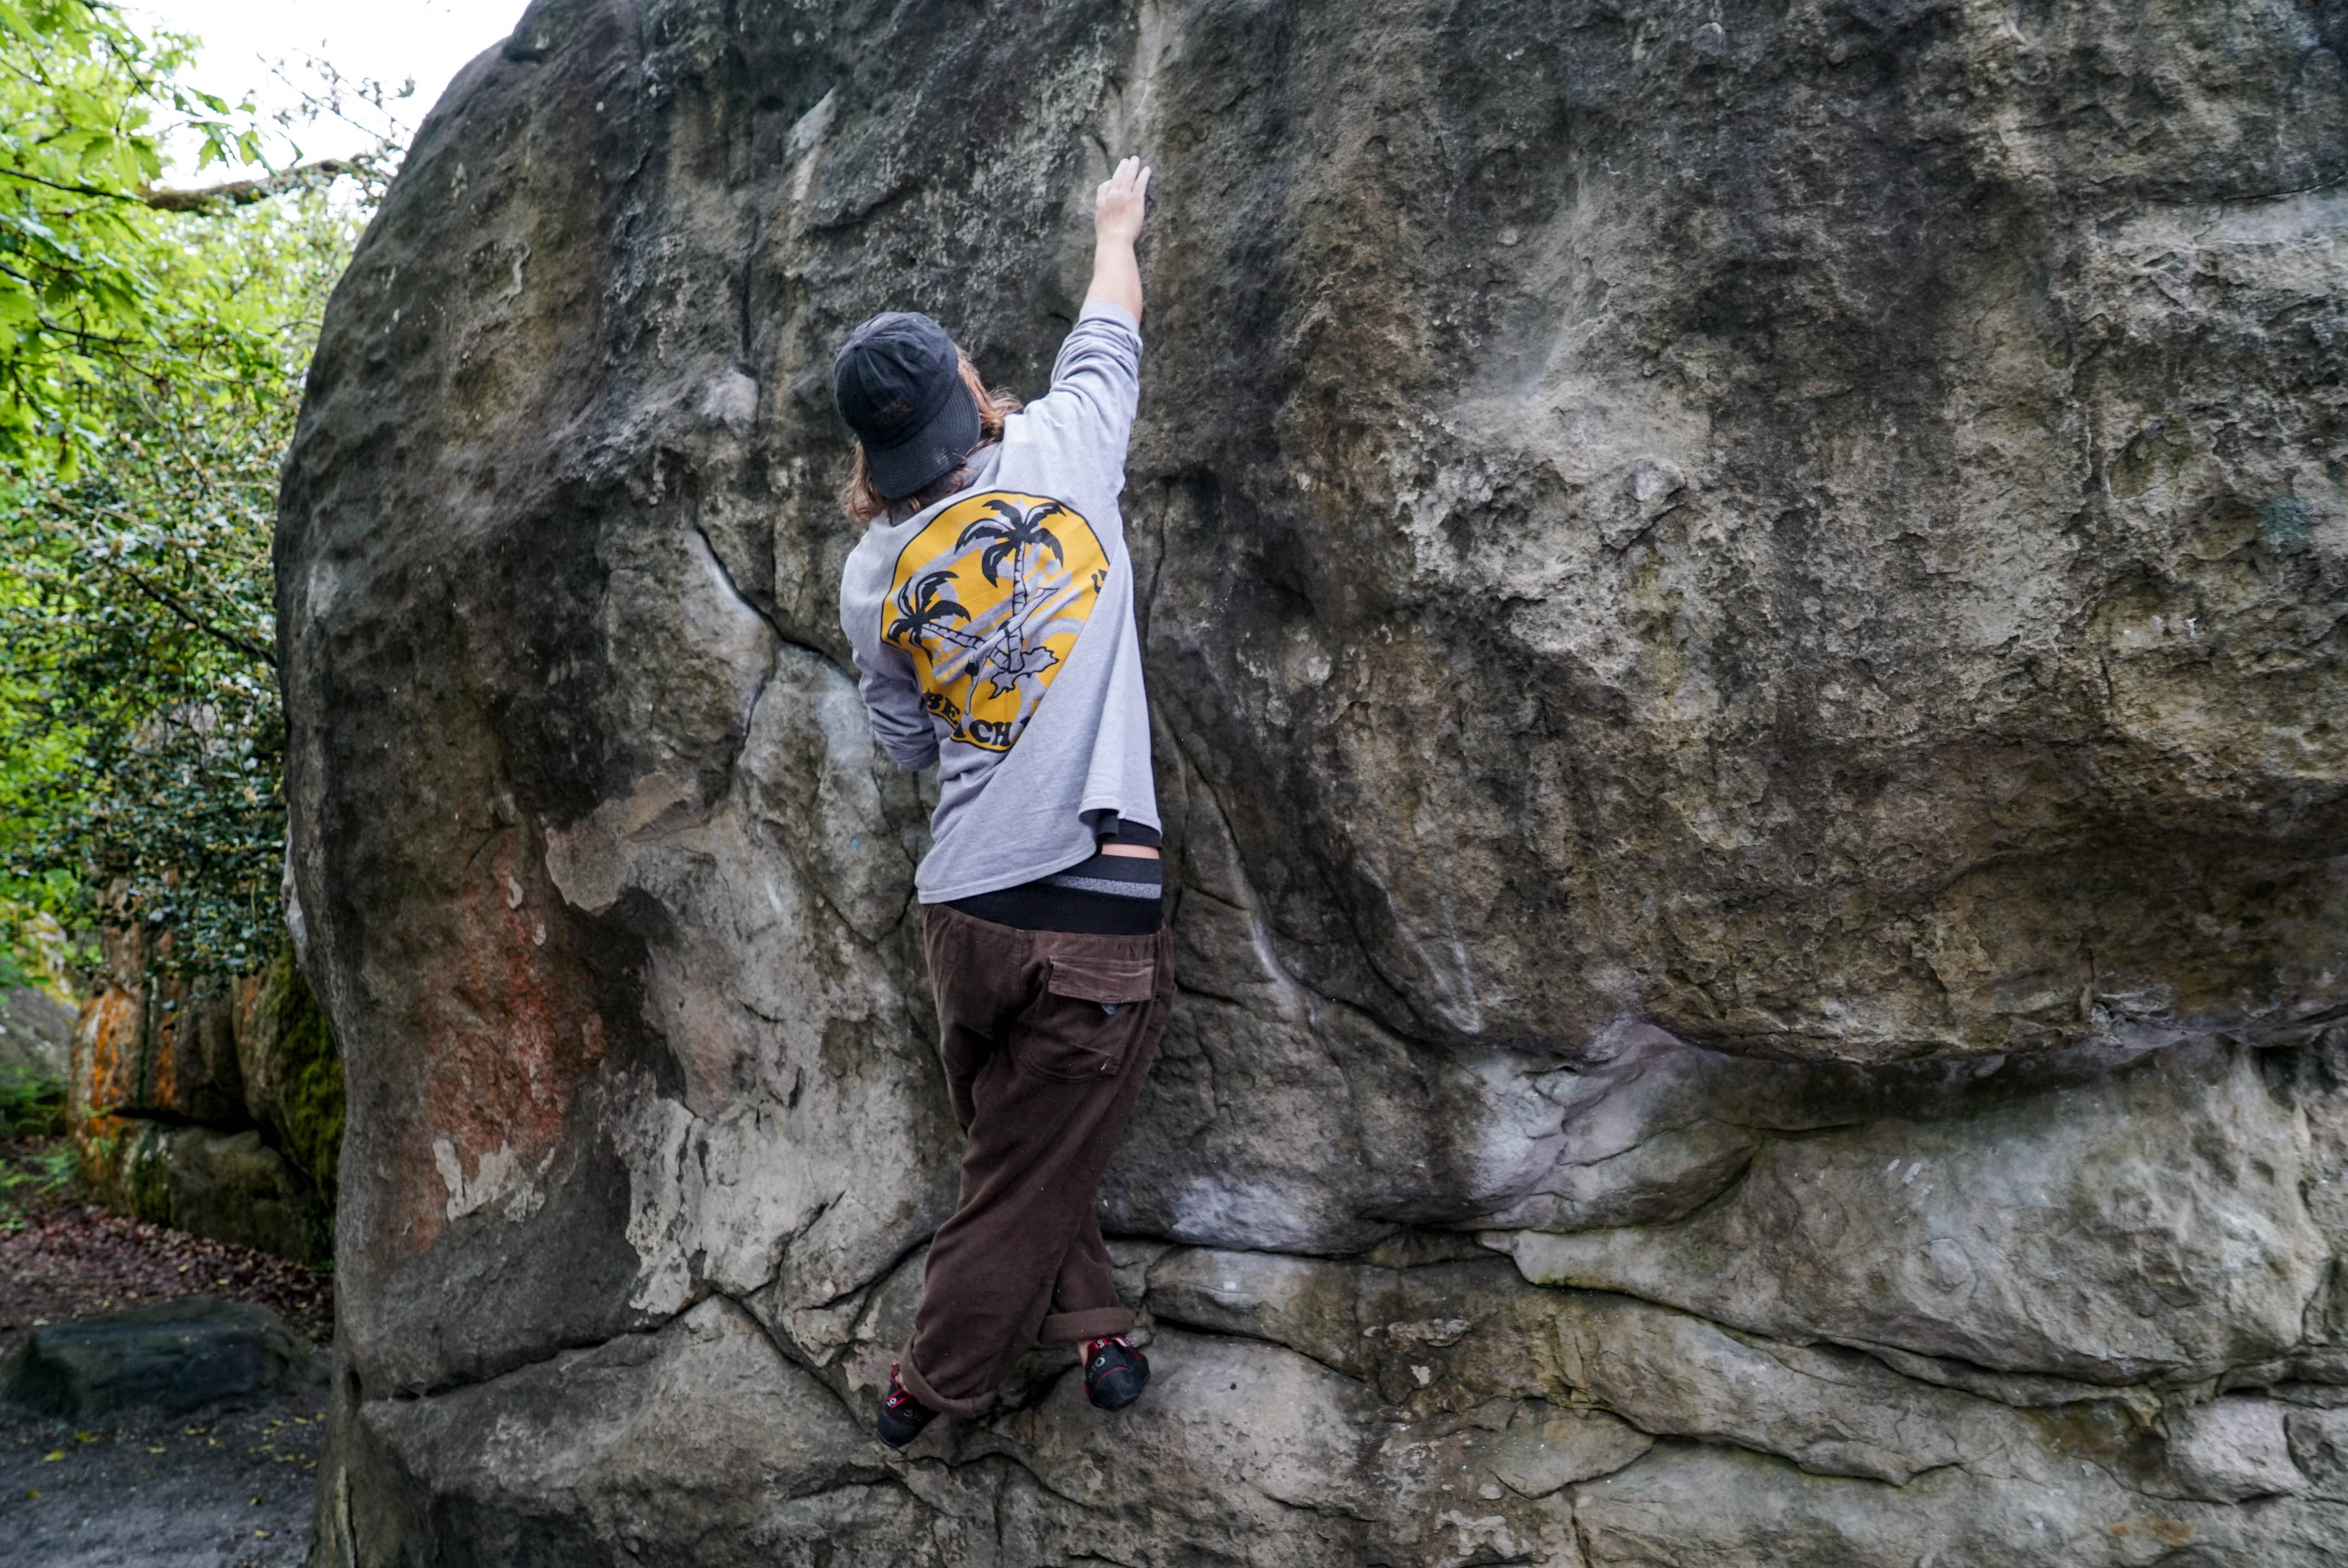 fontainbleau climbing 2016 mike brindley-36